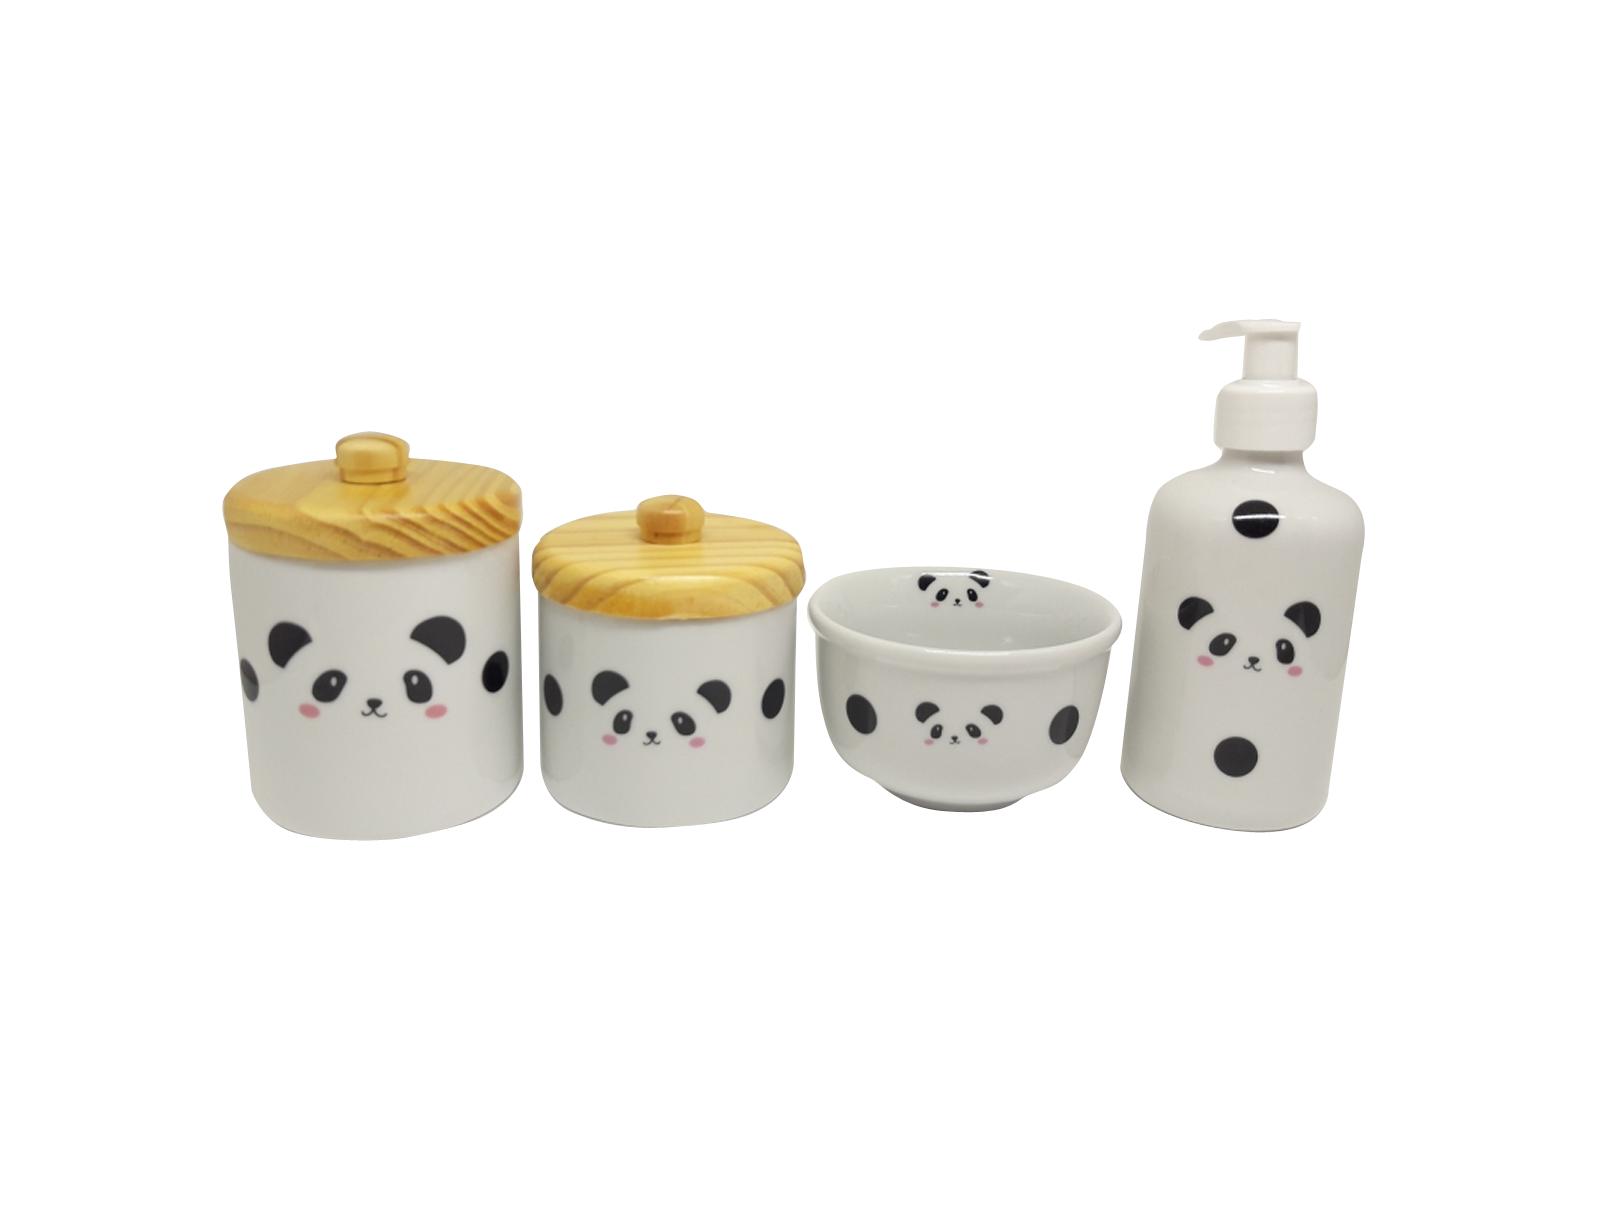 Kit Higiene Bebê Porcelana Escandinavo |Panda|4 peças | Tampas Pinus